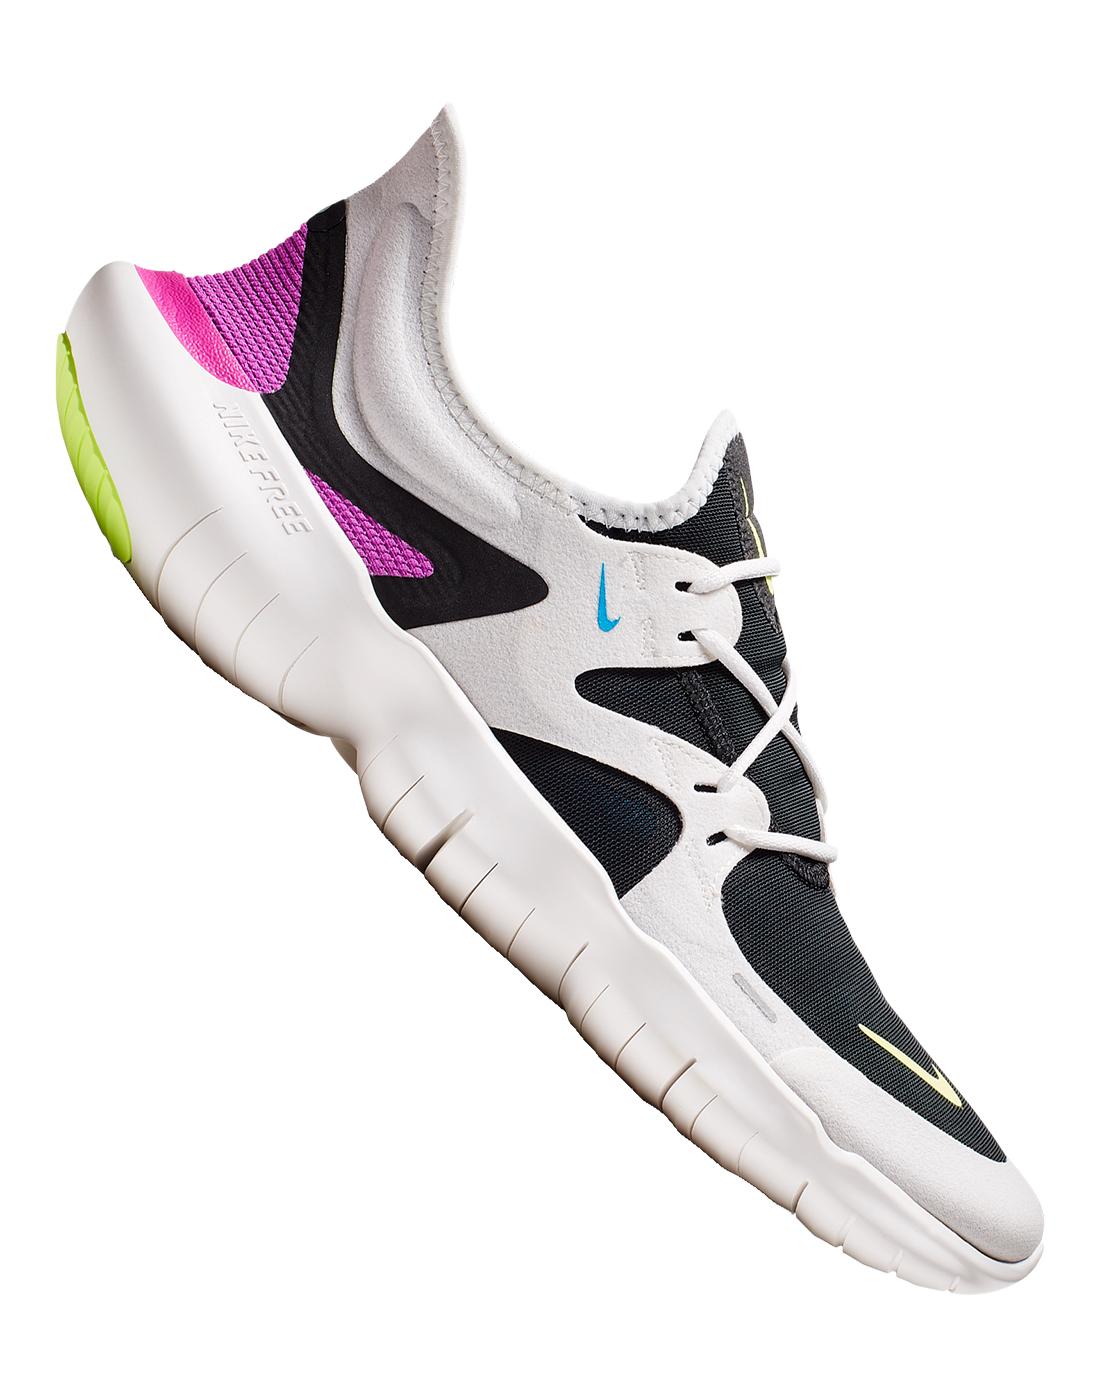 Men's White Nike Free Run 5.0 | Life